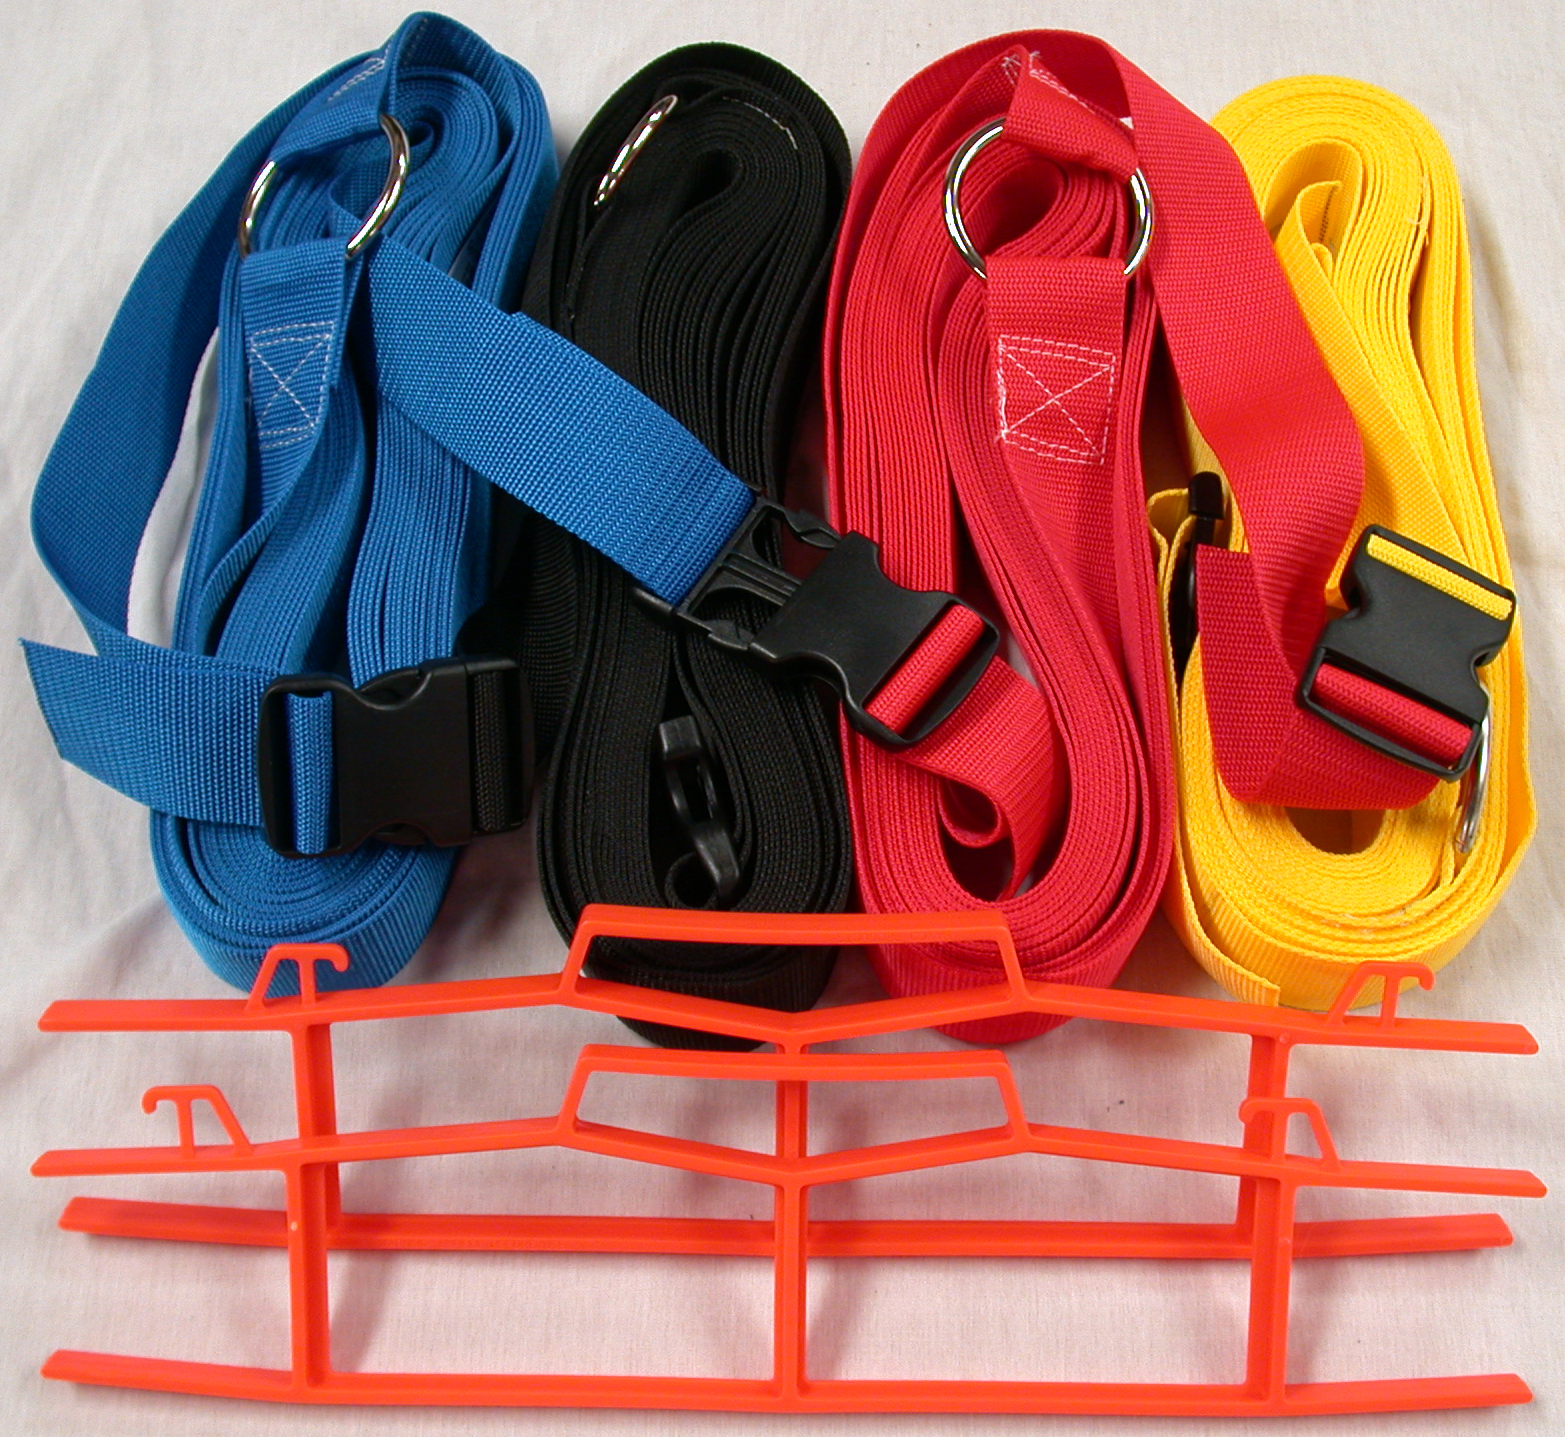 Volleyball Accessories